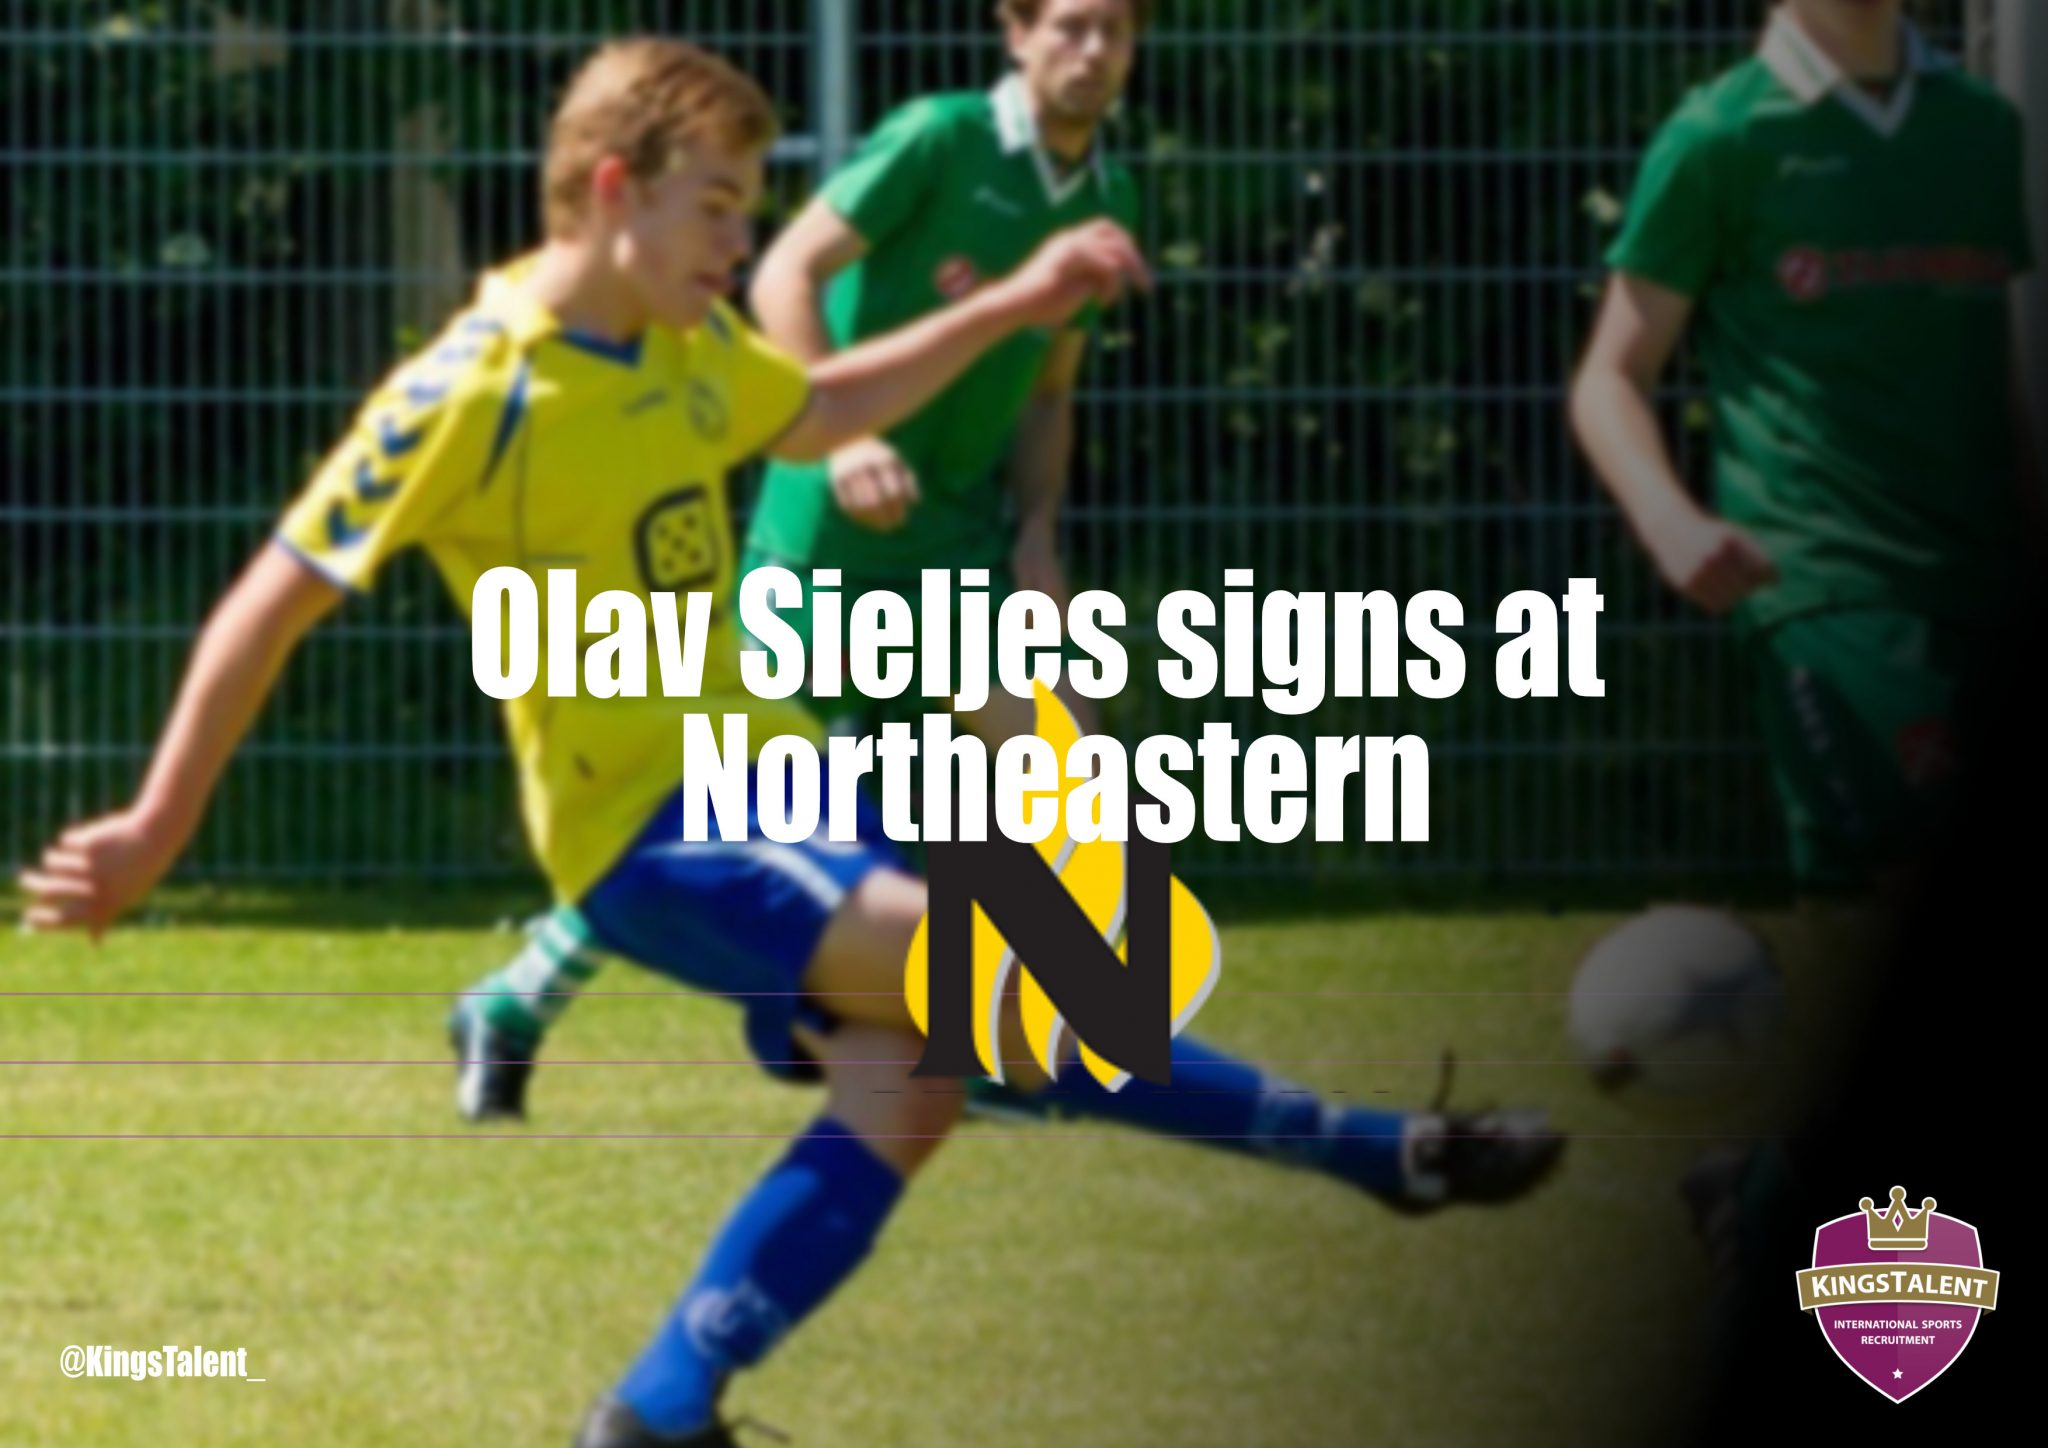 Olav Sieljes signs at Northeastern JC